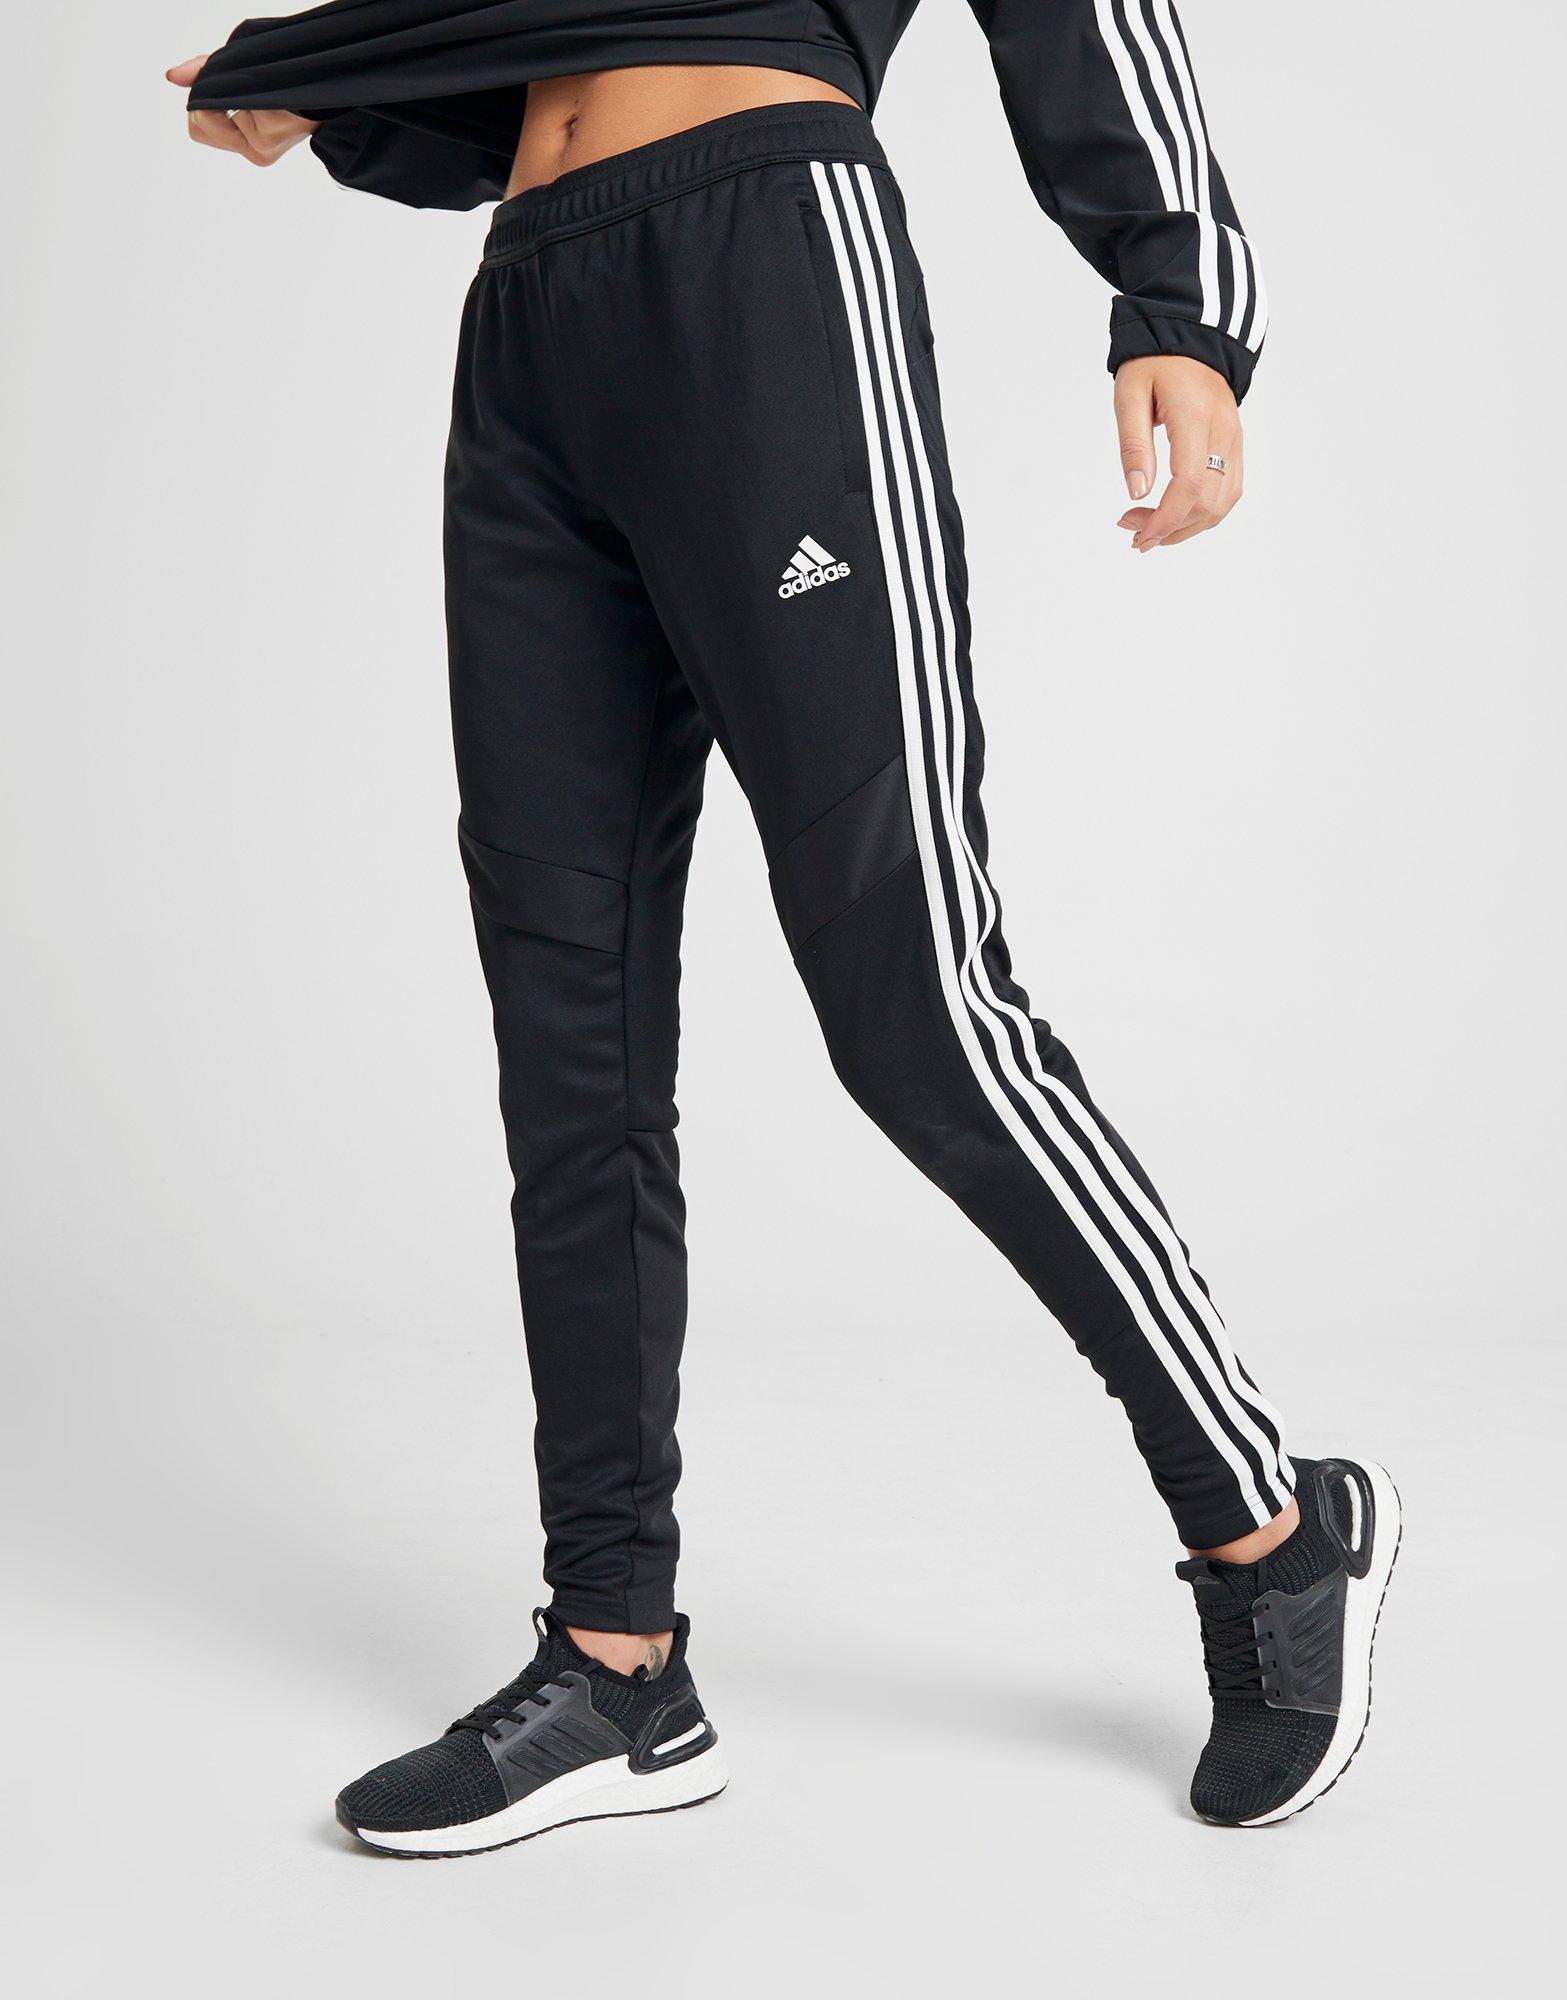 Actor Persona responsable Ir a caminar  adidas trainingsbroek dames sale Off 62% - gupteshworcave.com.np